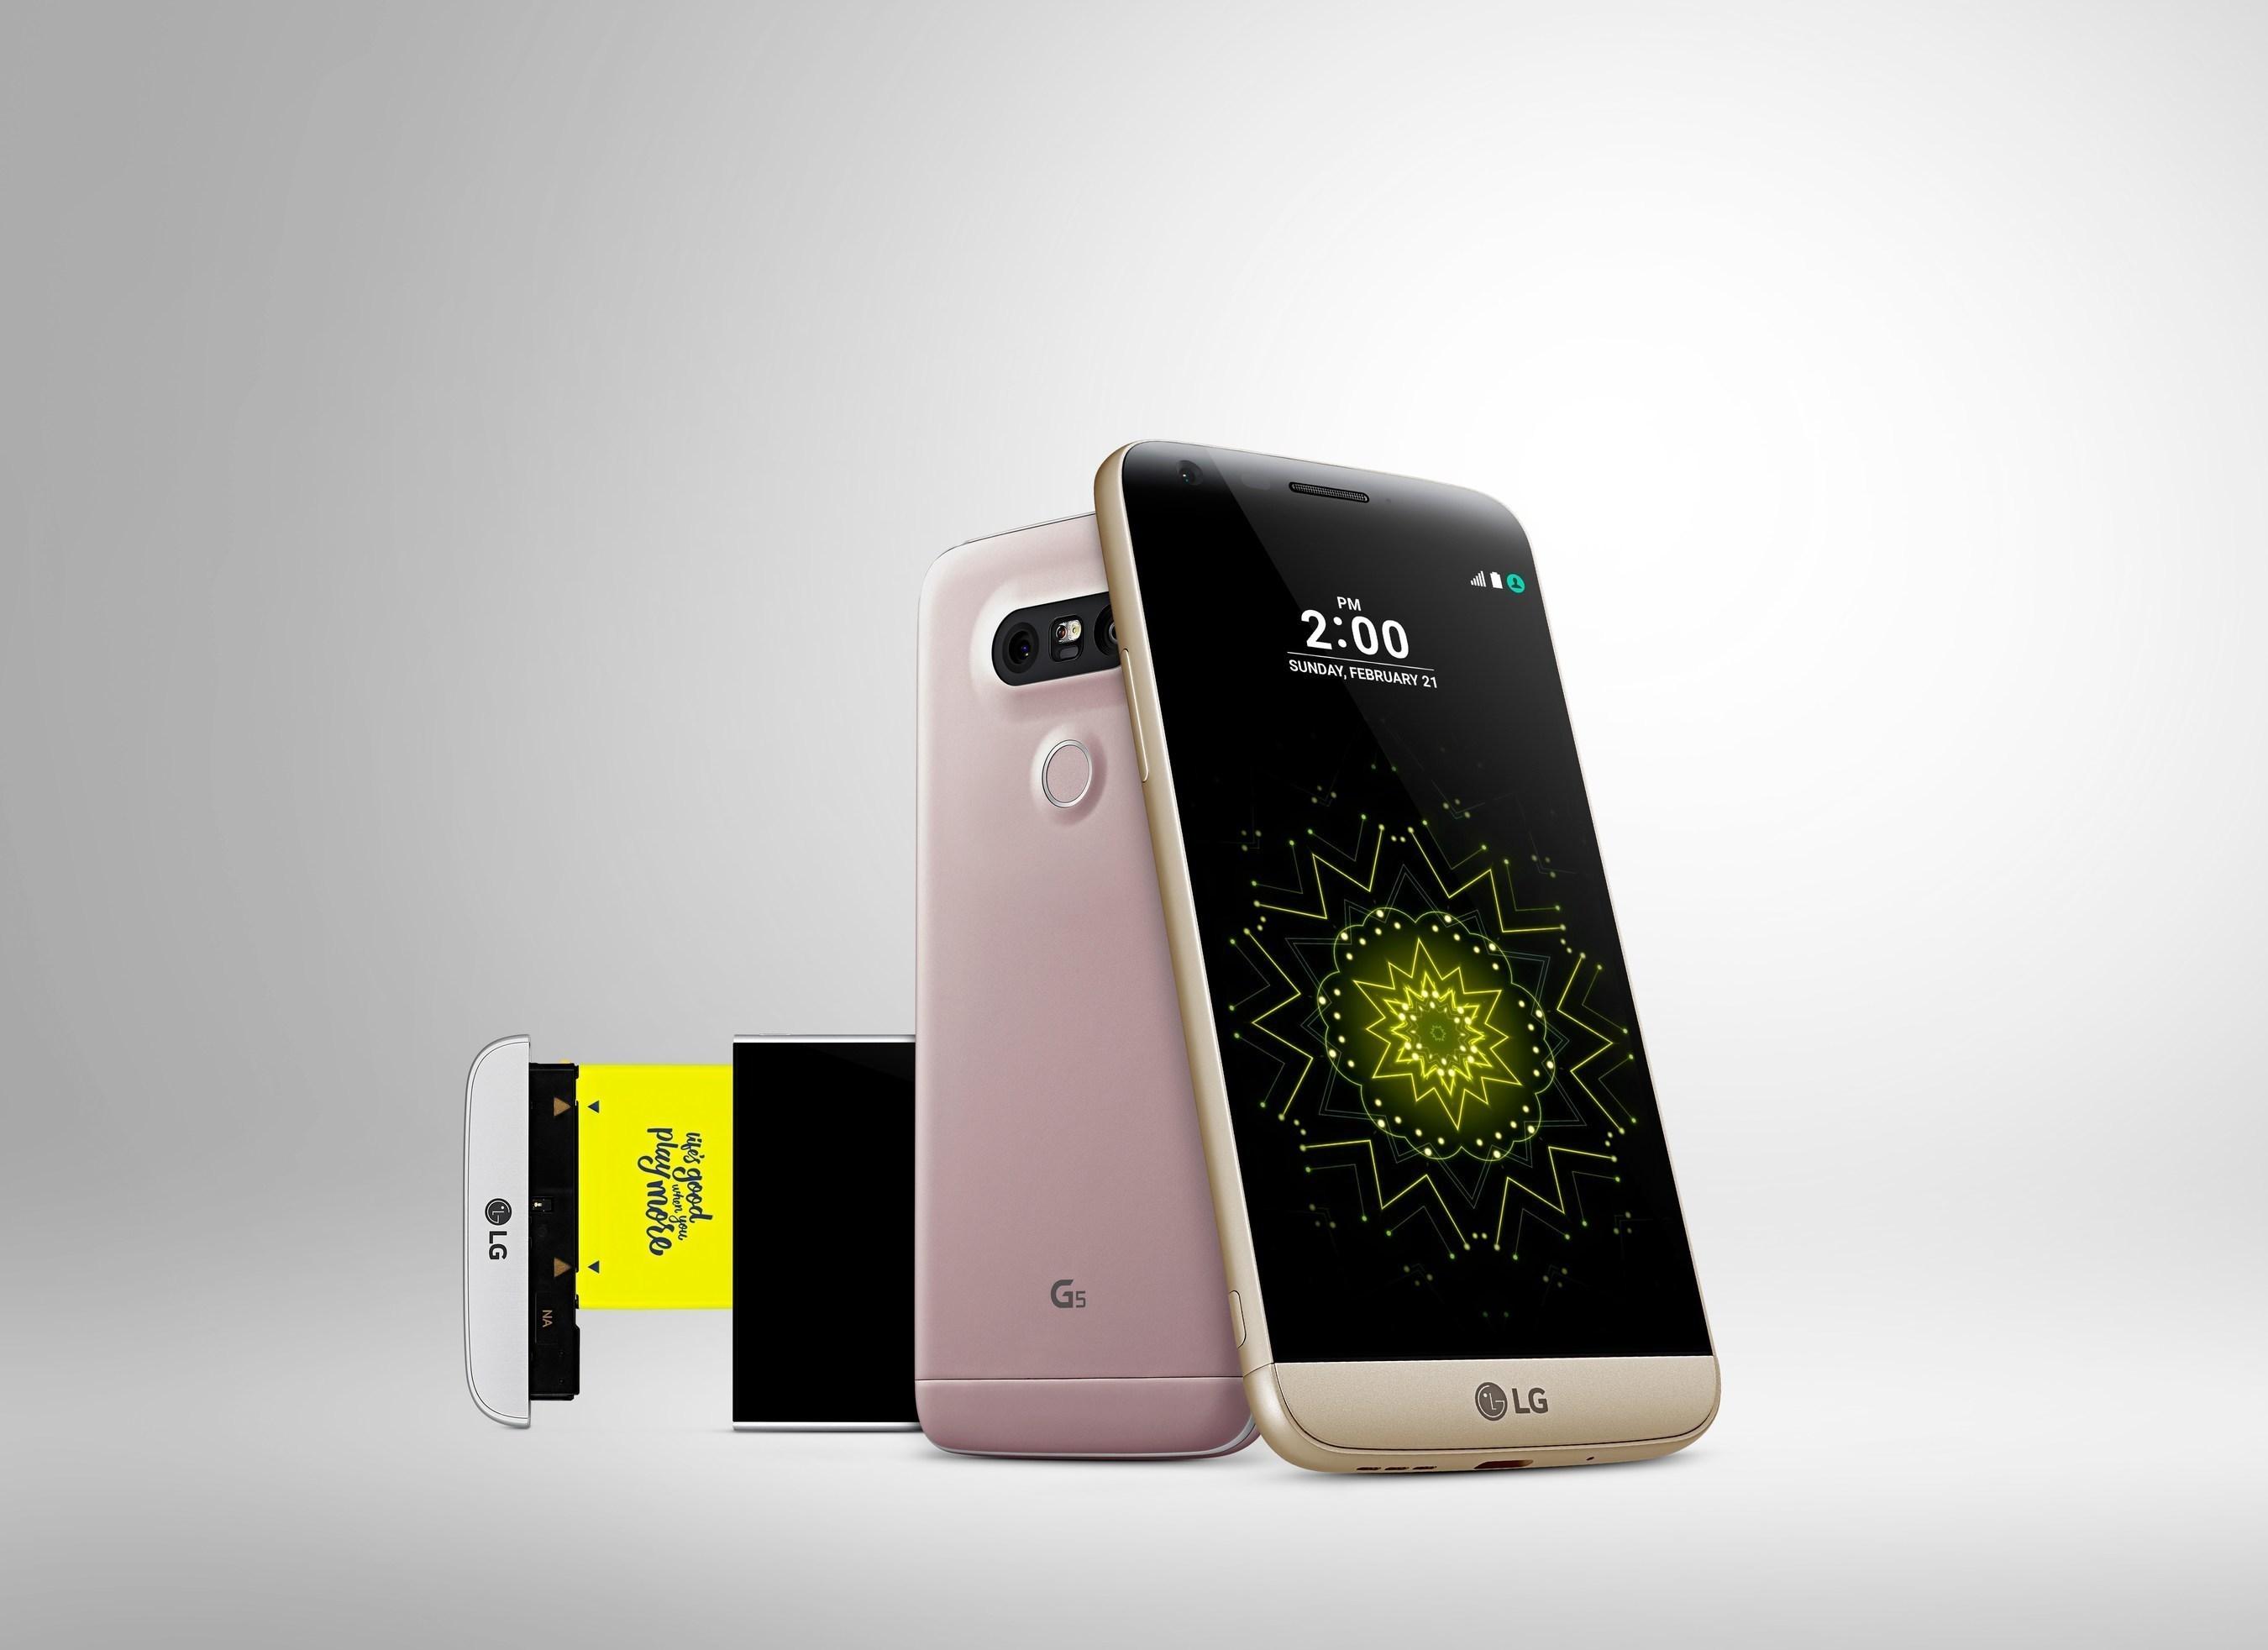 LG Opens Up LG G5 Modular Design To Developers